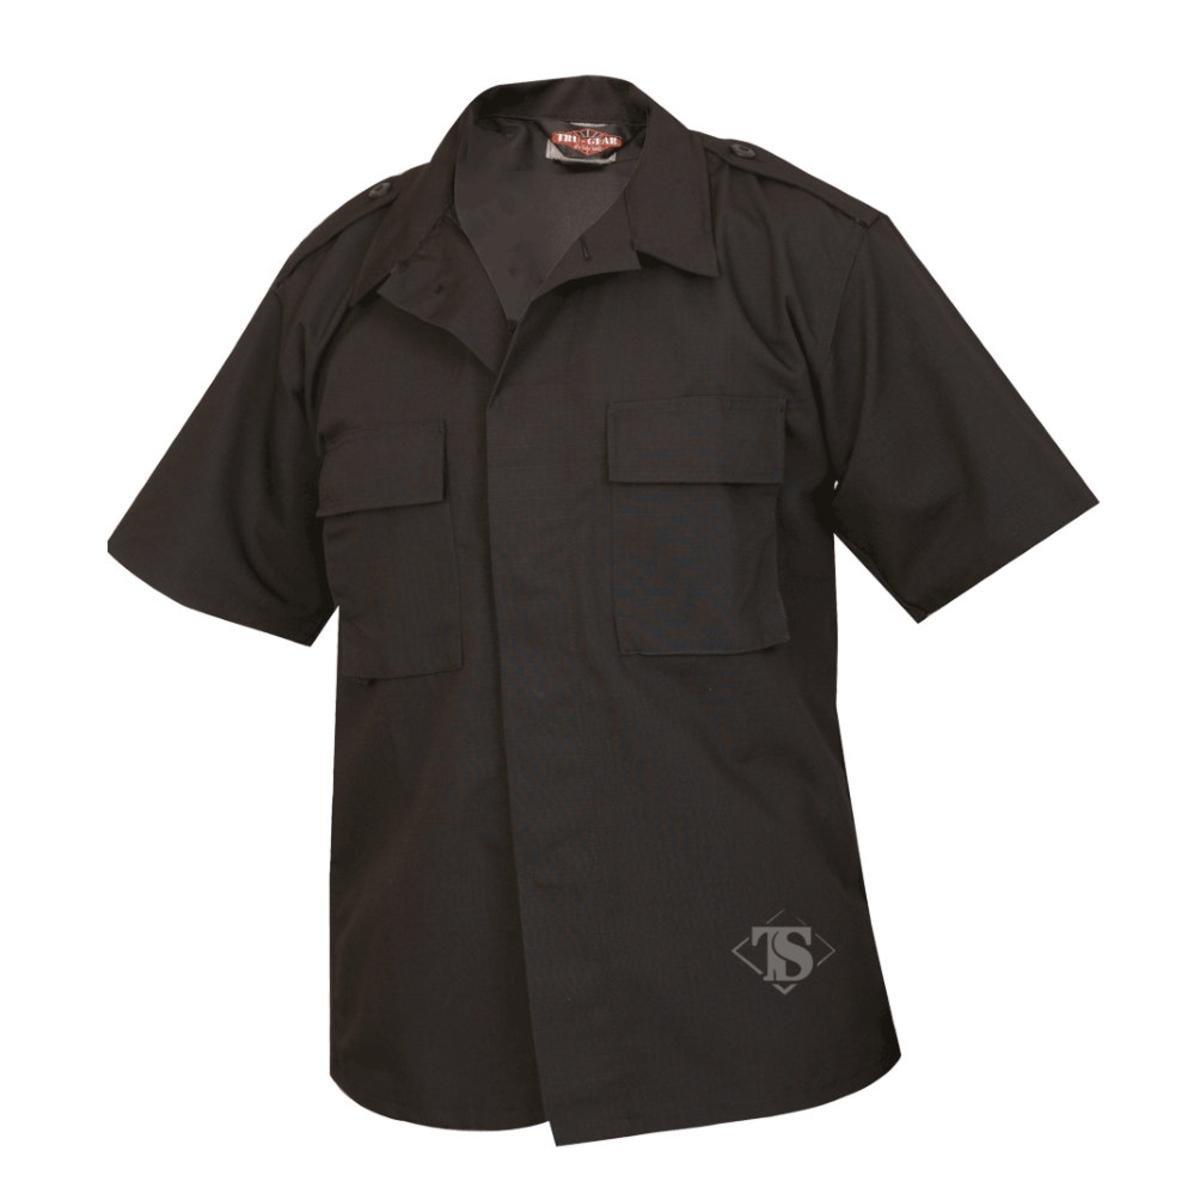 Black 2X-Large Regular ATLANCO 1000007 Short Sleeve Tactical Shirt